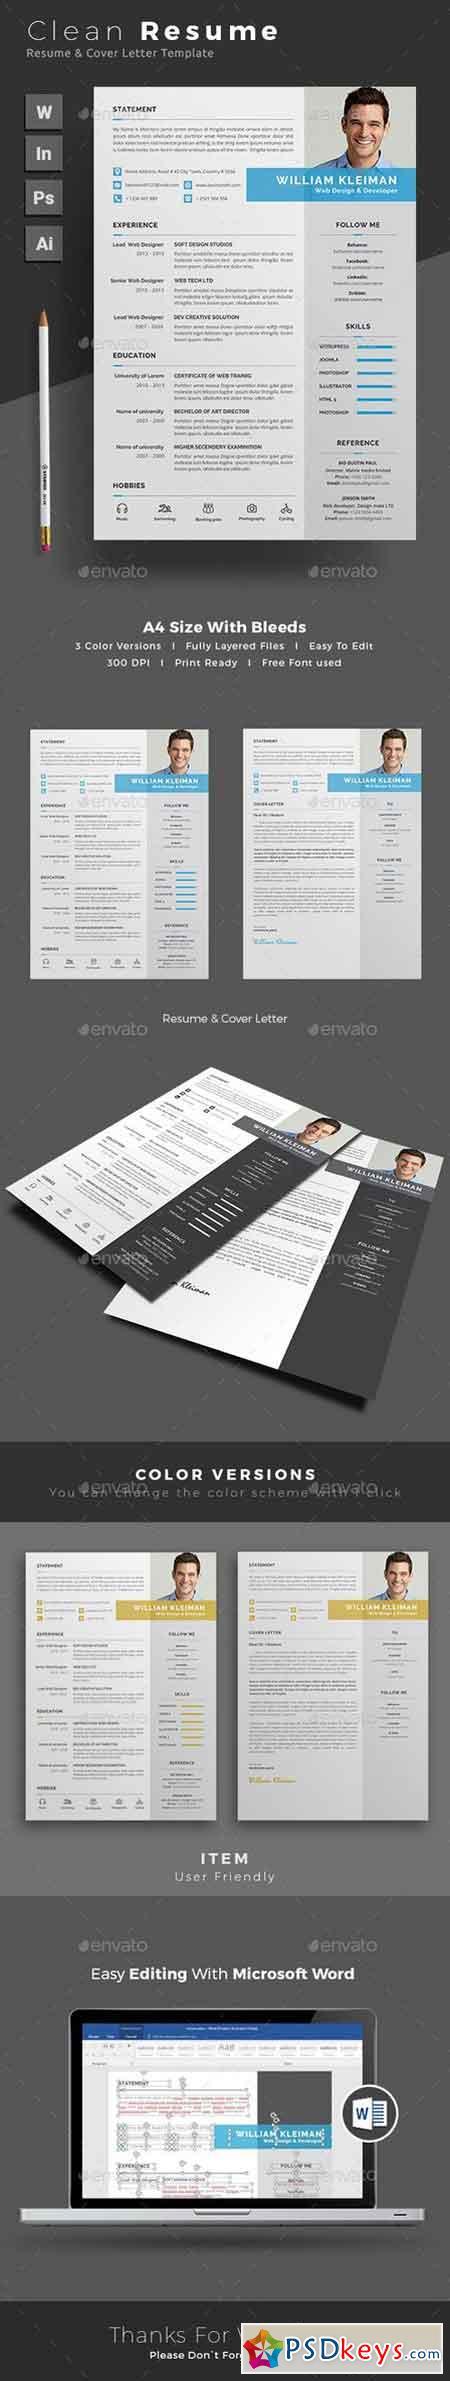 resume 19253324 free download photoshop vector stock image via